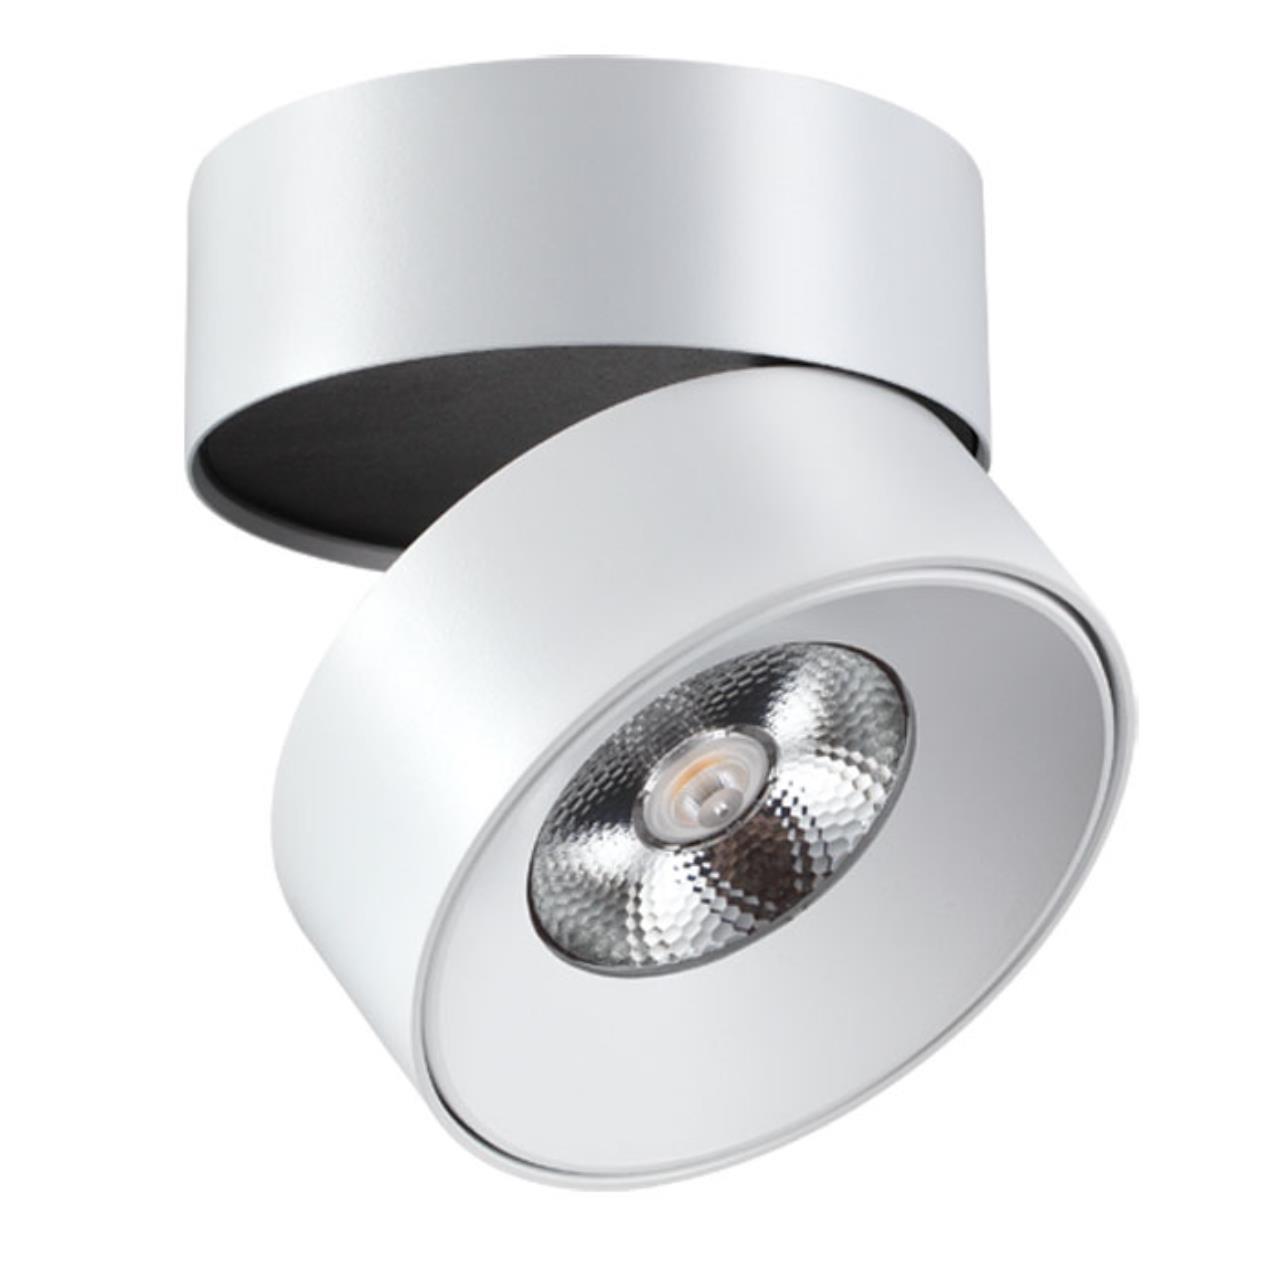 357473 OVER NT18 074 белый Накладной светильник IP20 LED 3000K 25W 100-240V TUBO